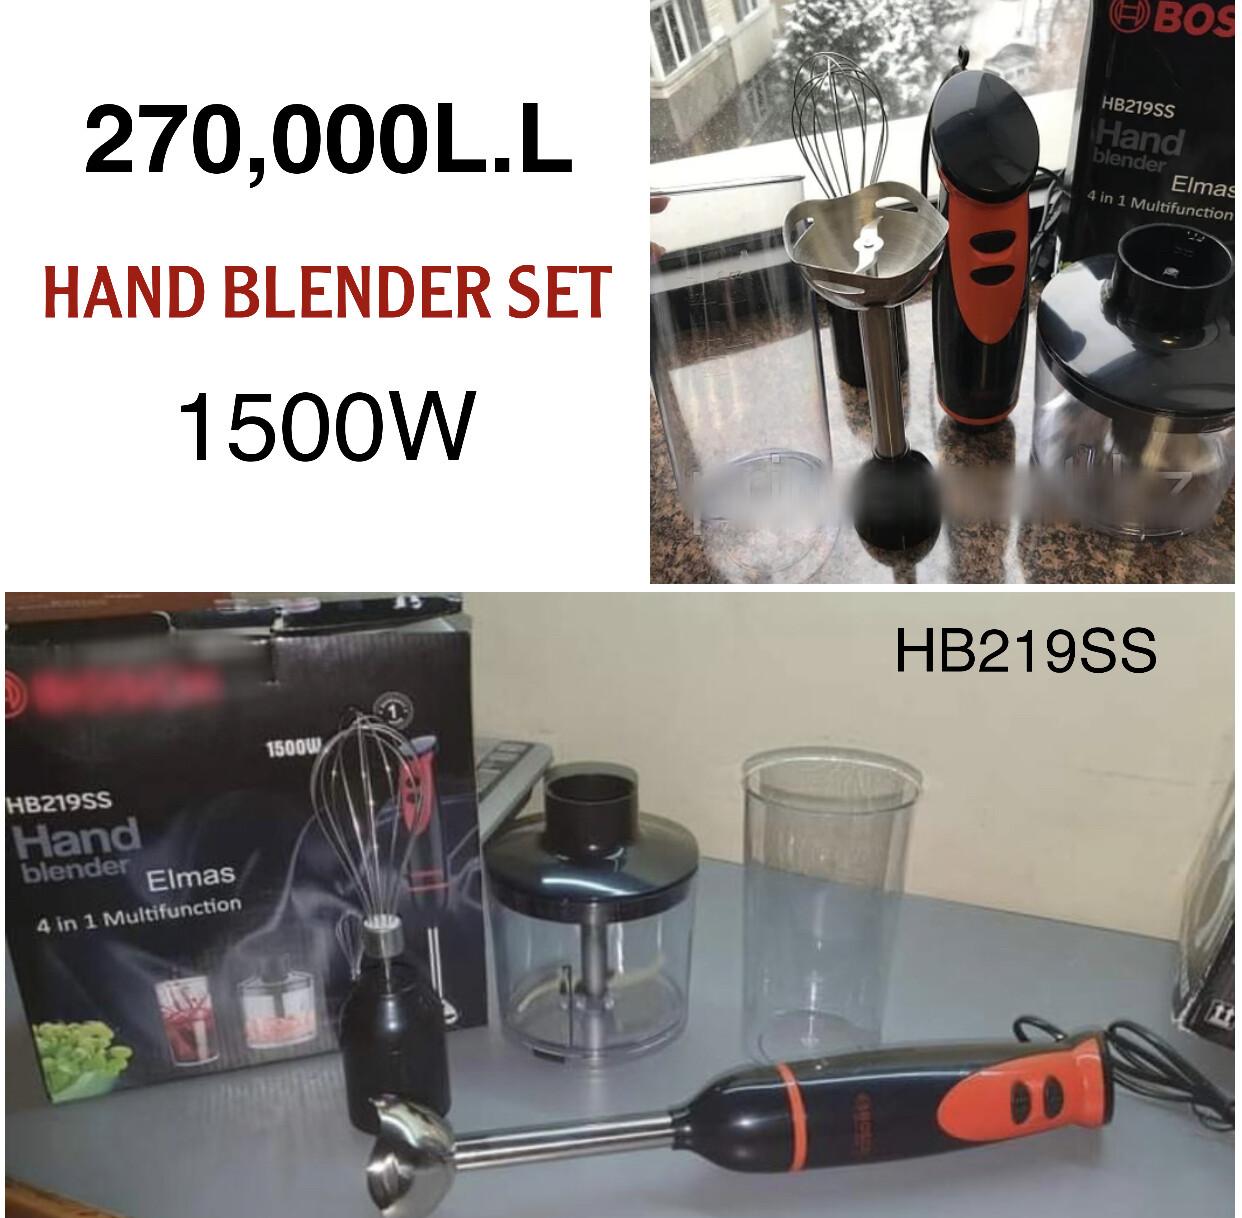 Hand Blender Set (HB219SS)